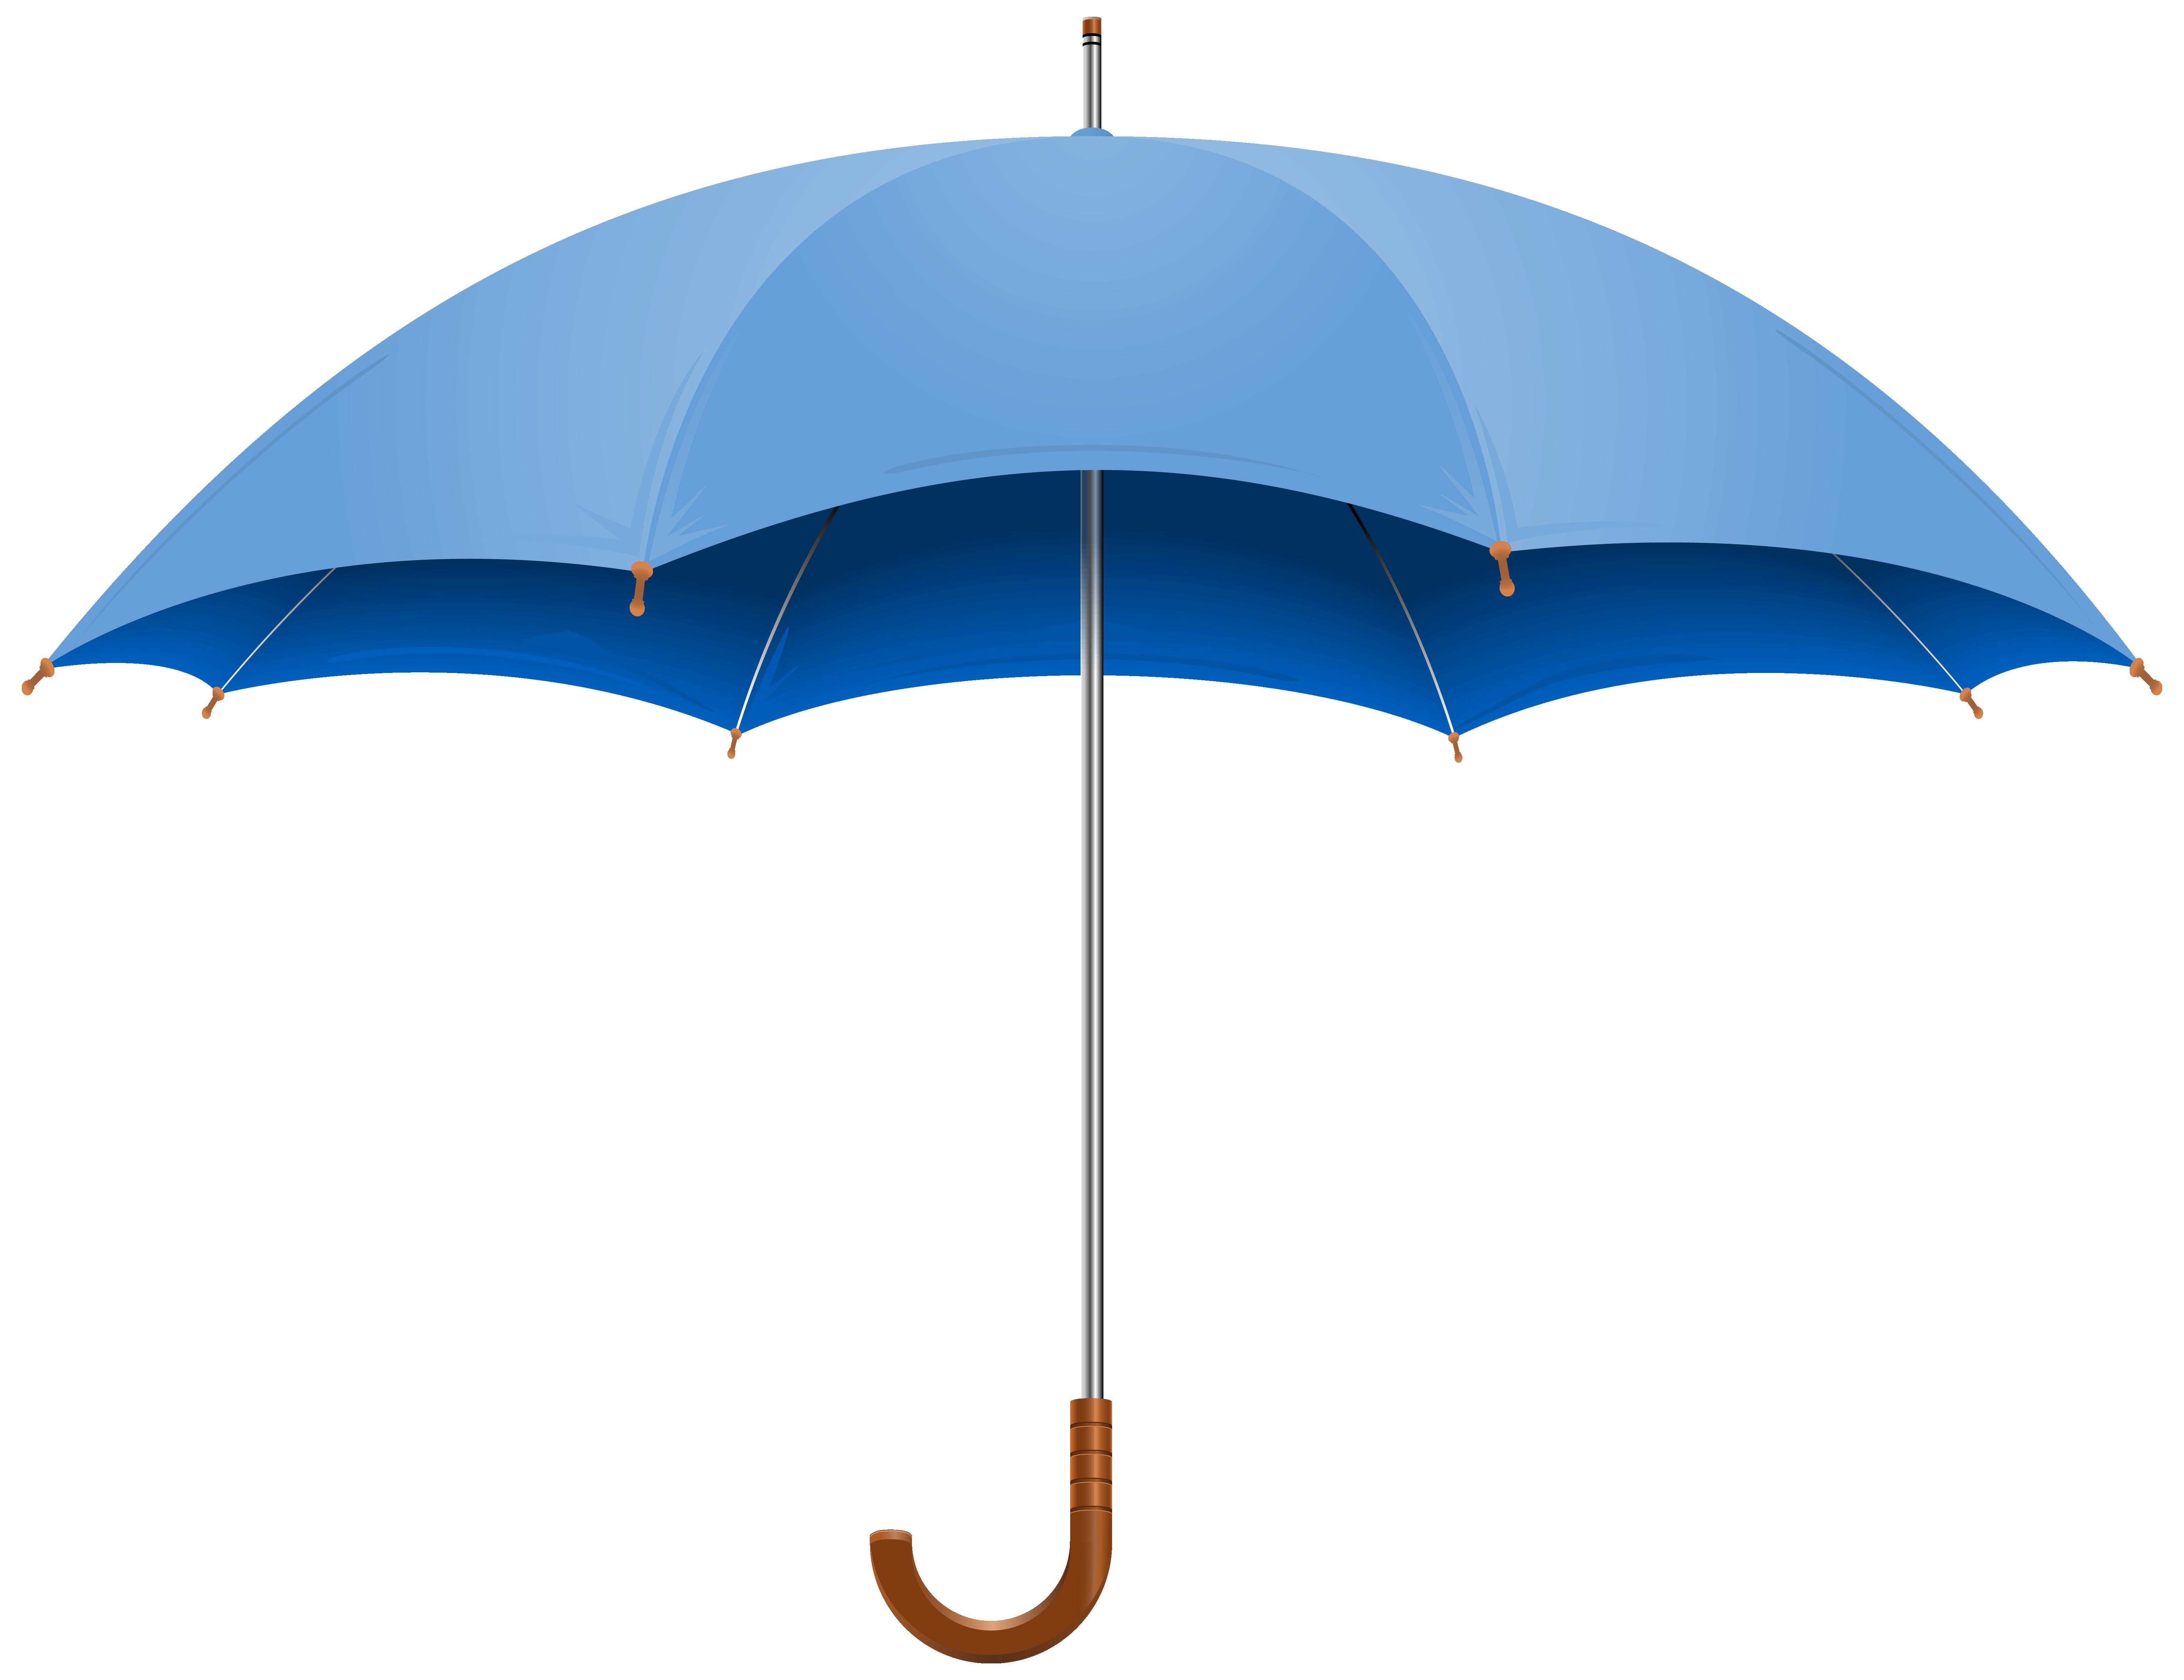 Blue open png image. Clipart umbrella banner